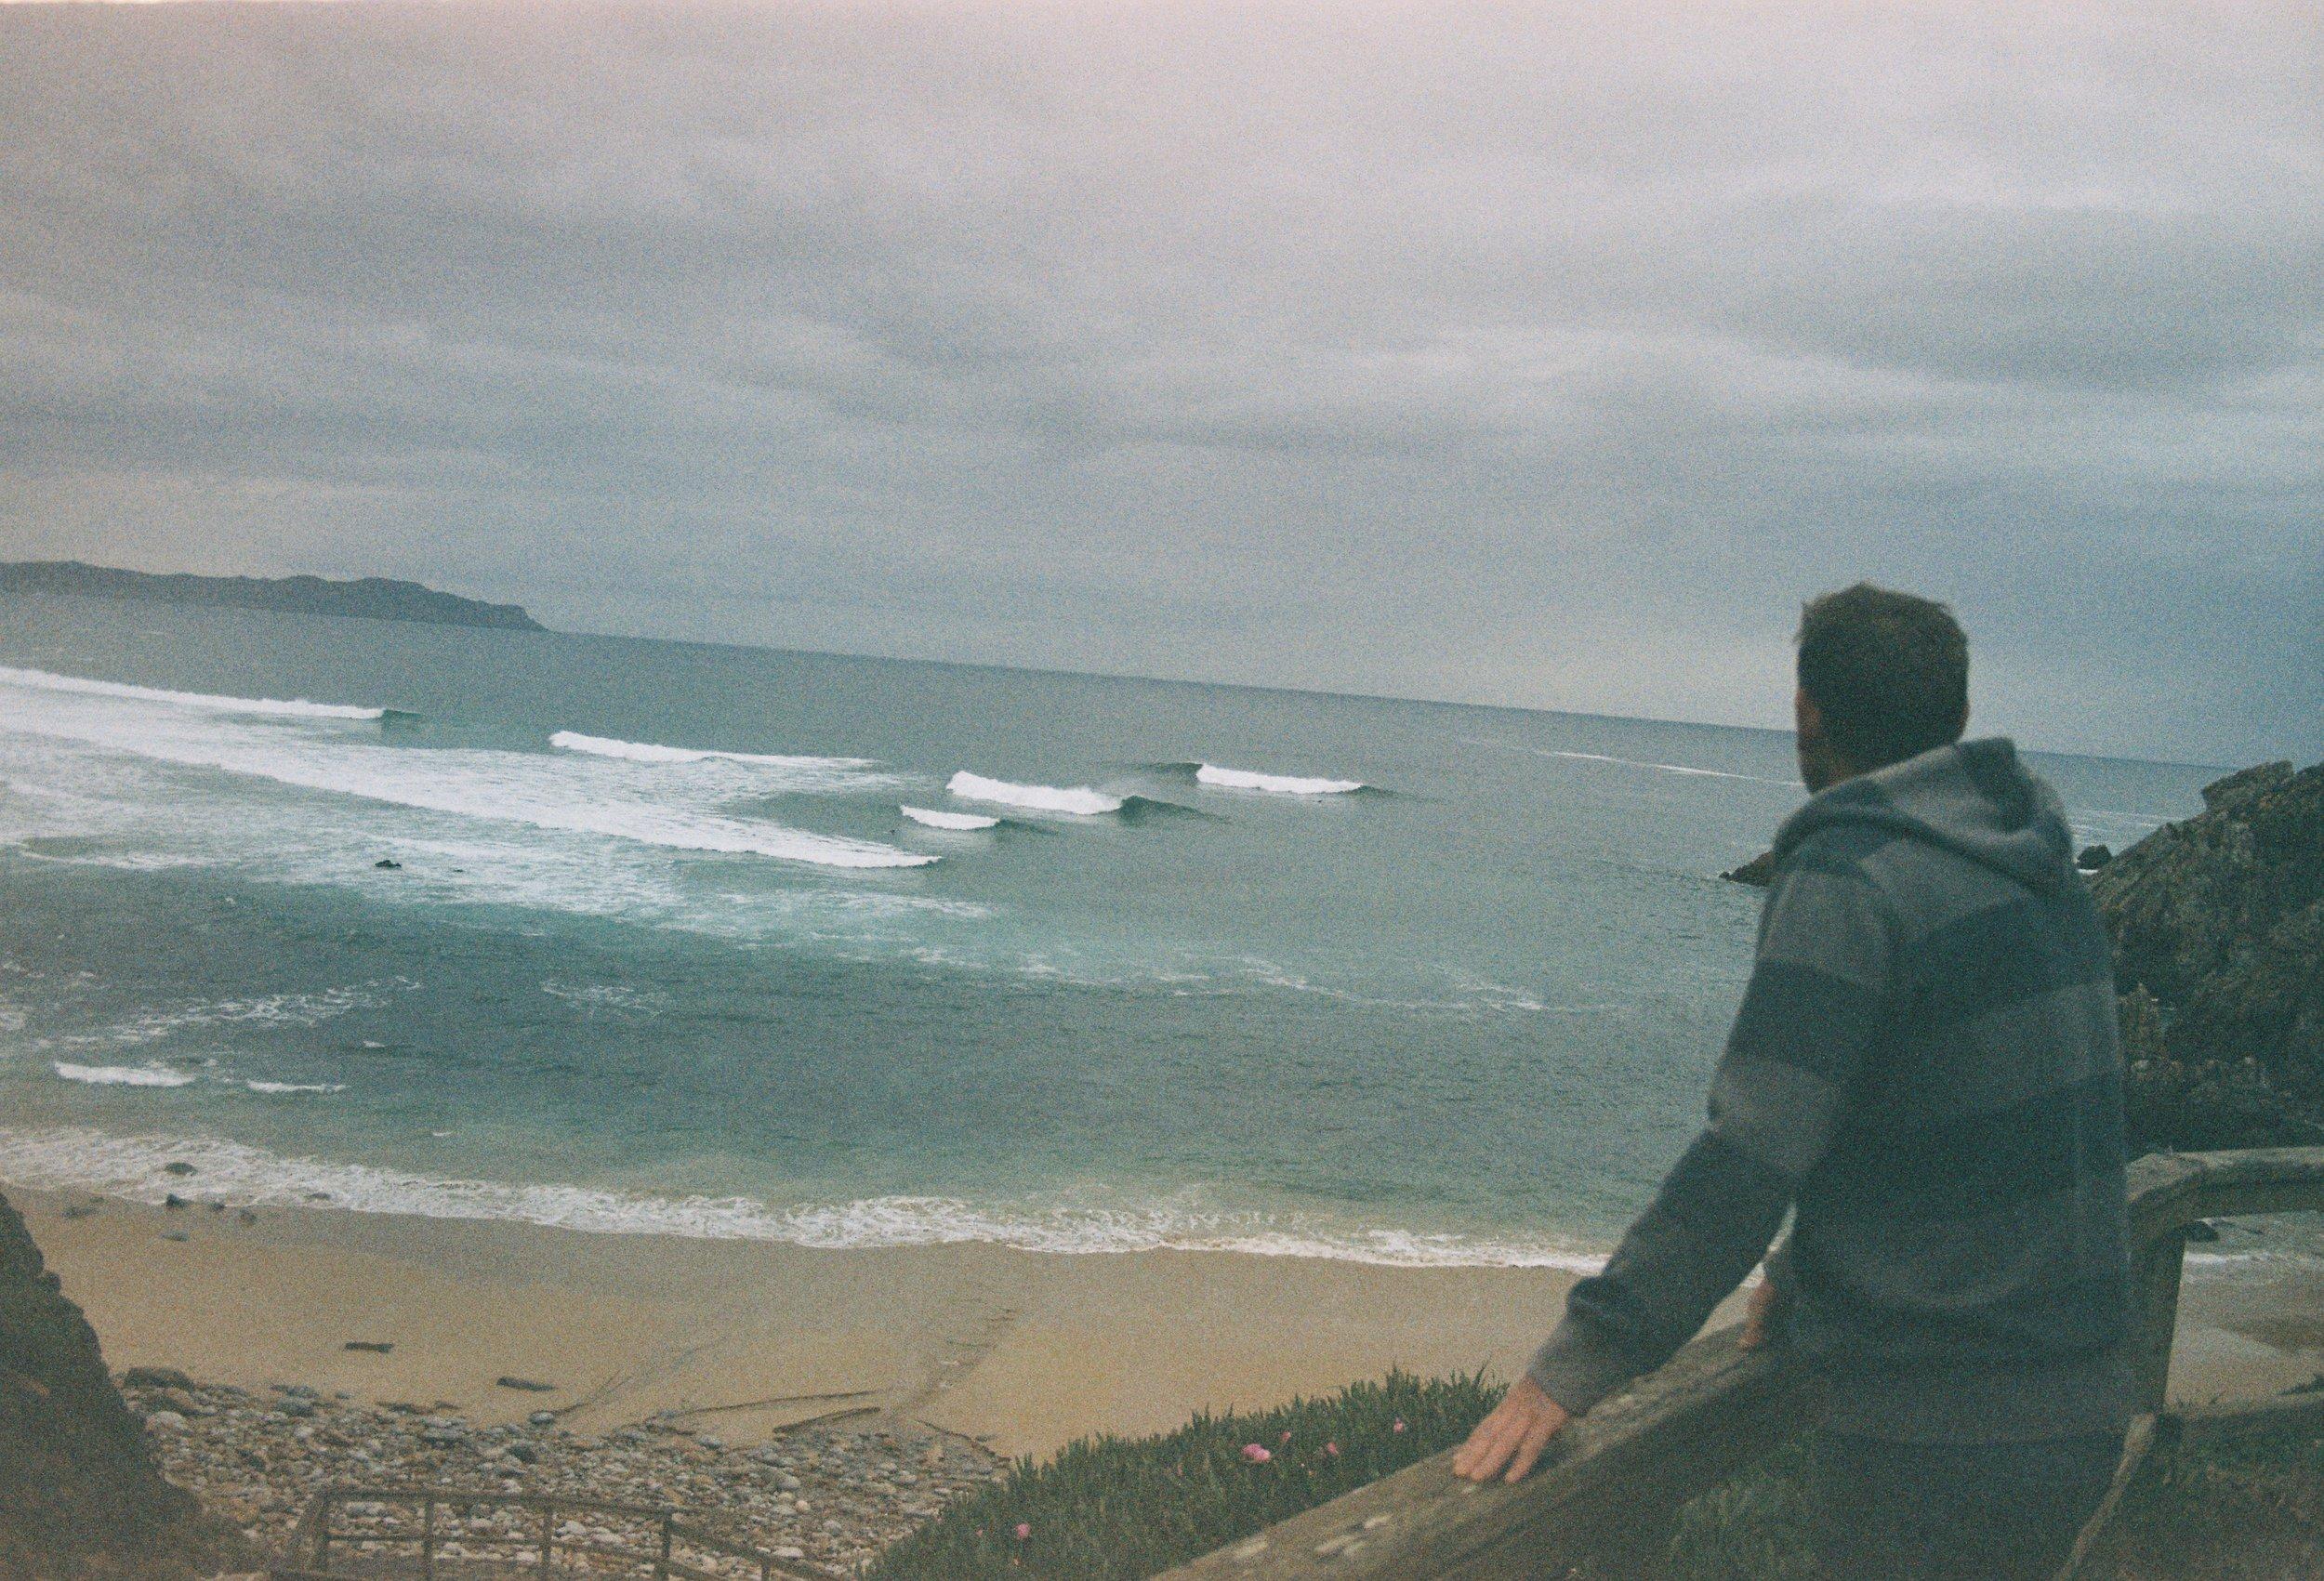 sam_ocean_waves_beach.JPG